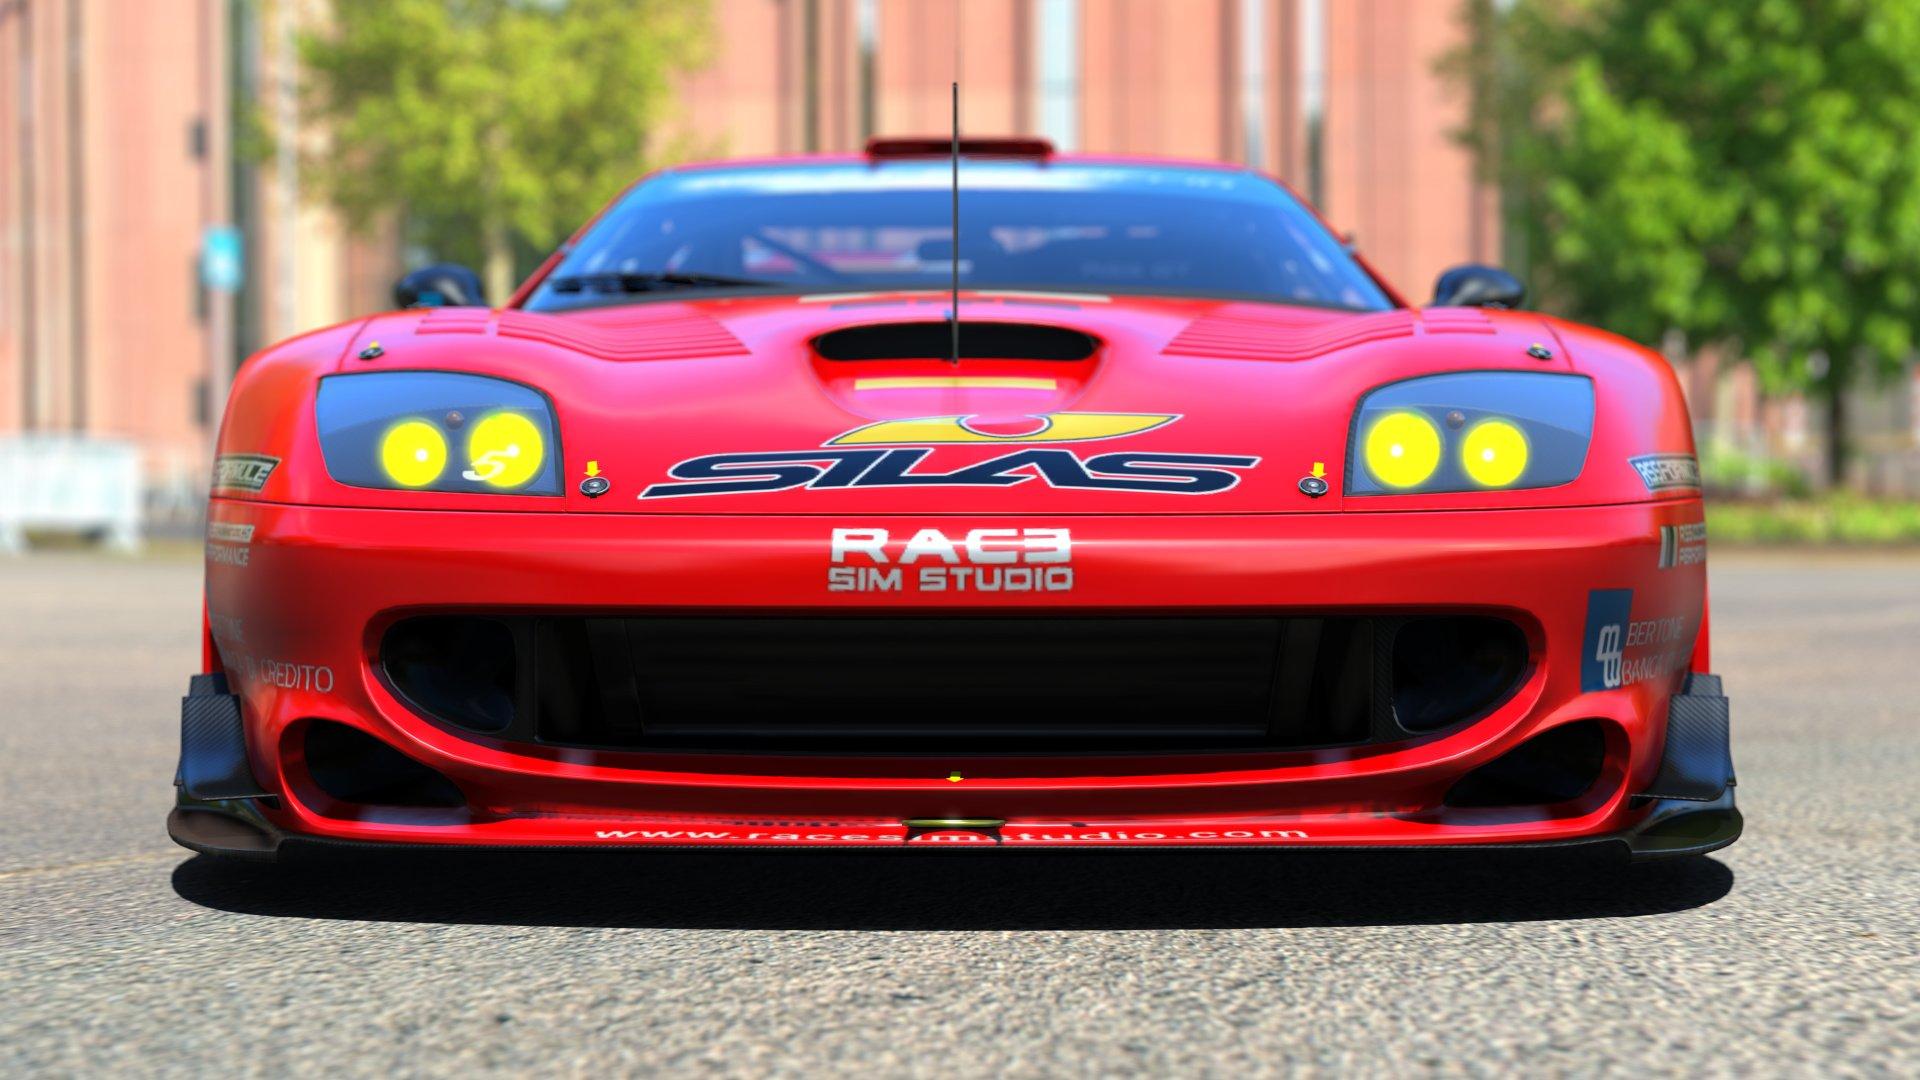 Race Sim Studio GT Pack part 1 Ferruccio 550 v12 1